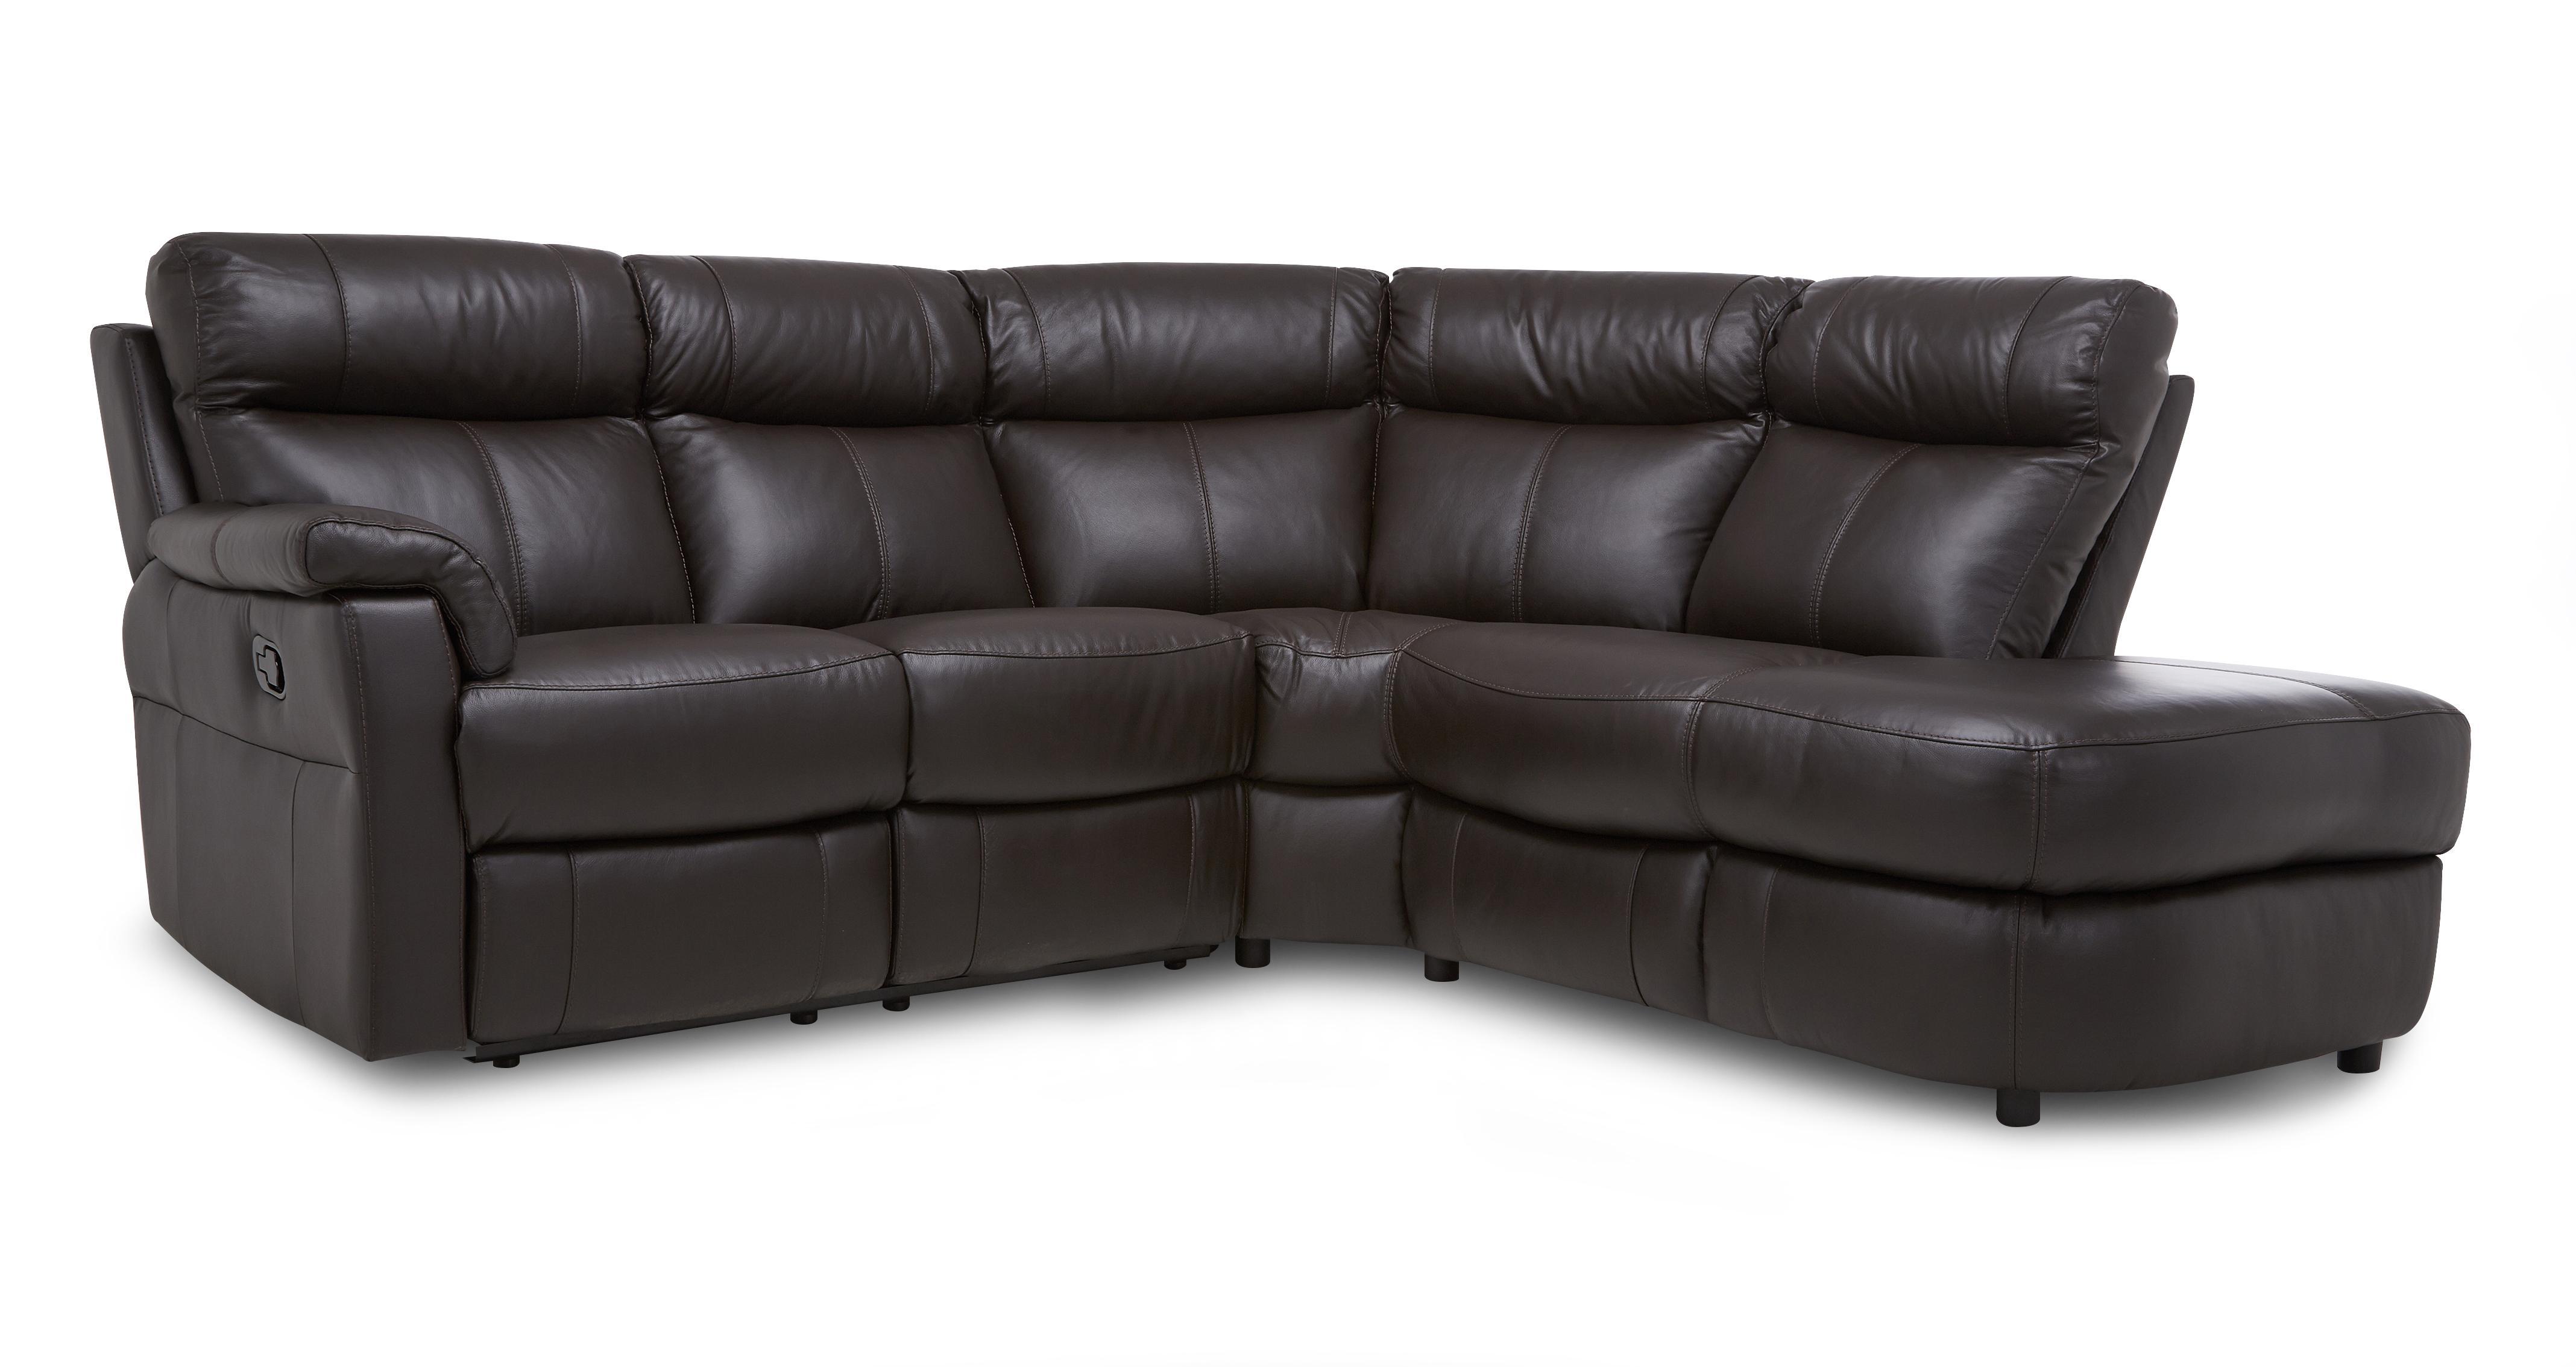 About the Ellis: Option B Left Arm Facing 2 Piece Manual Recliner Open End  Corner Sofa